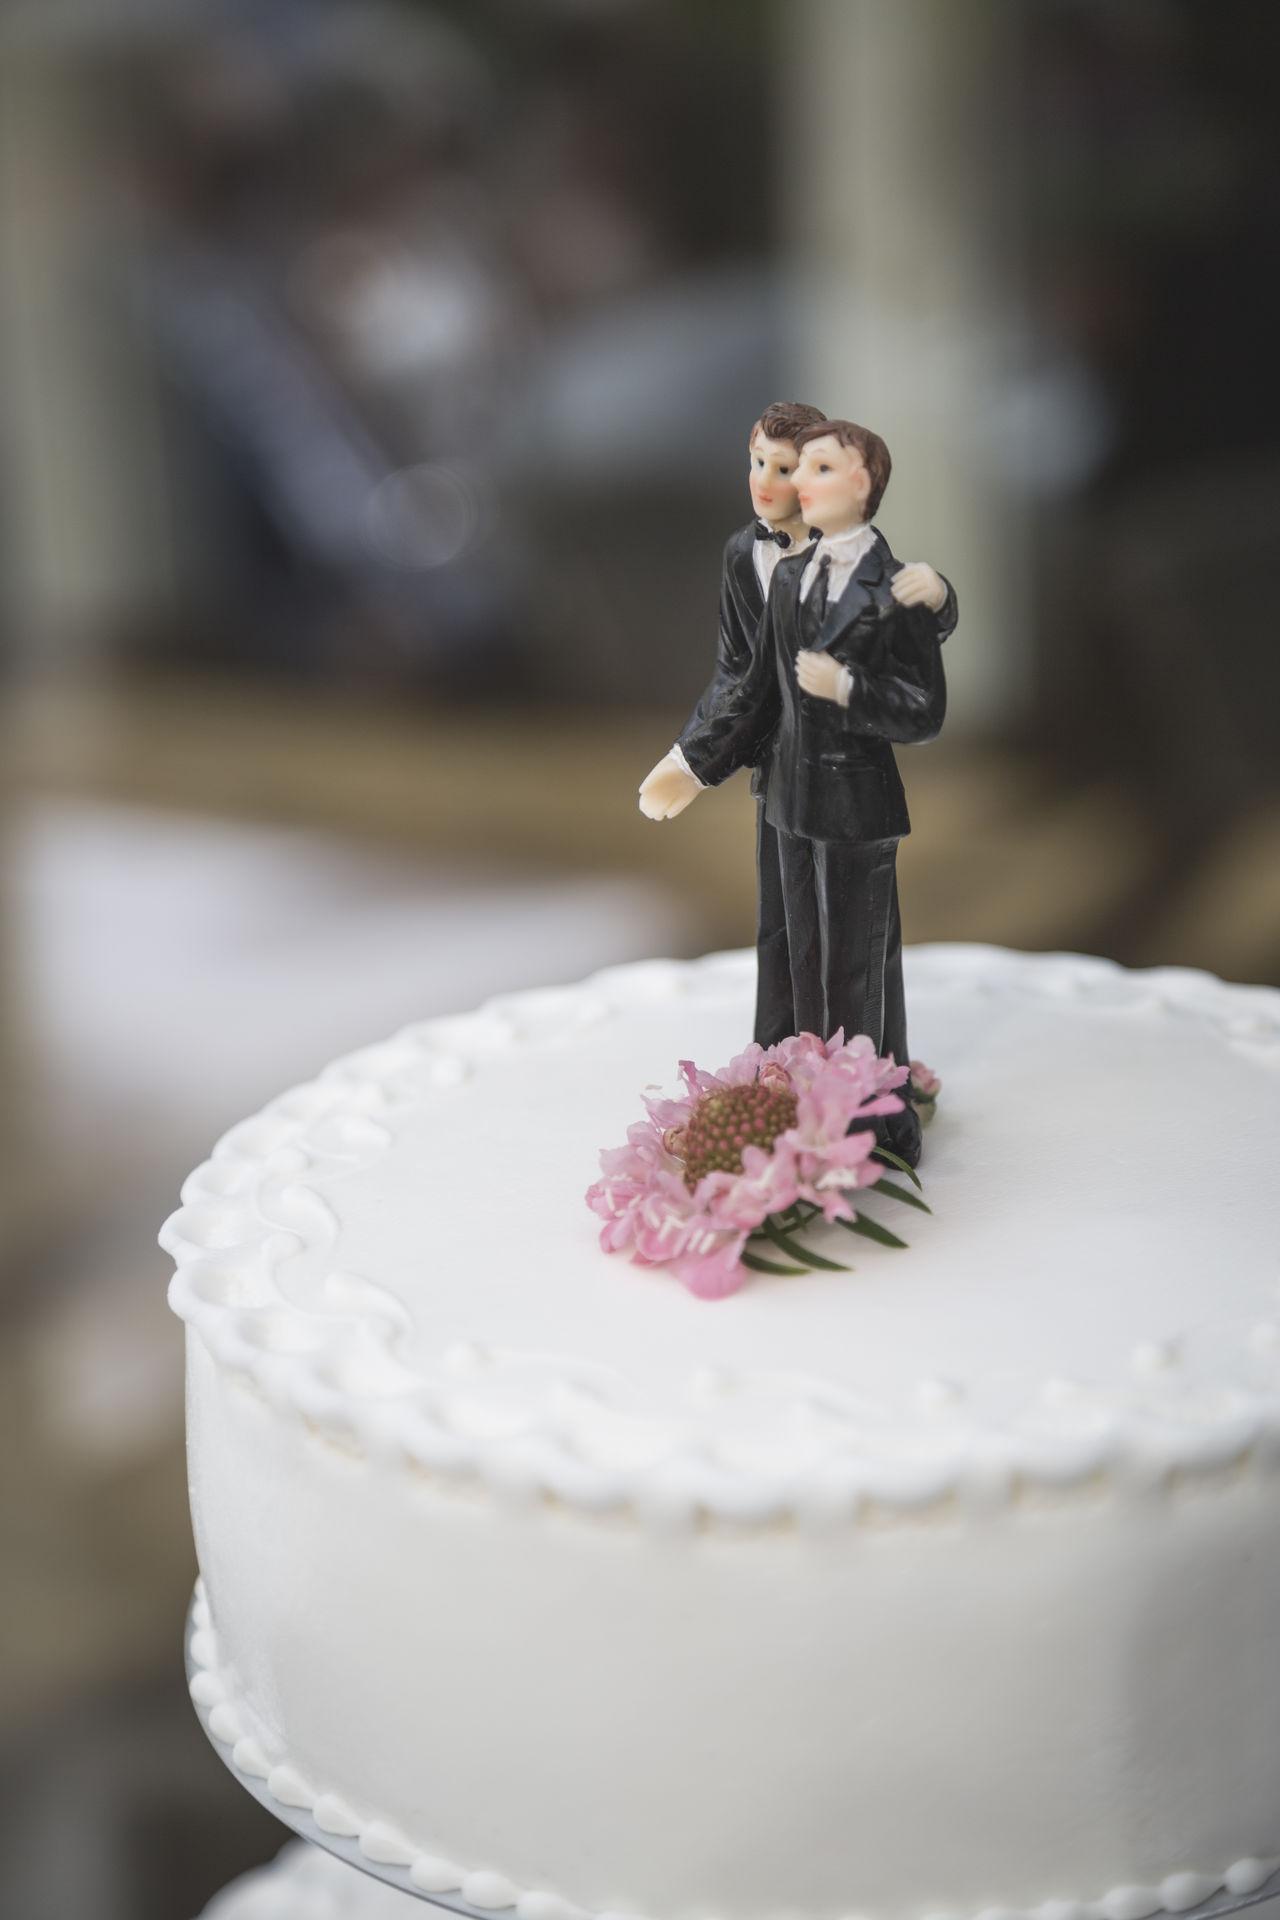 Cake Gay Marriage  Gay Wedding Gaymen Groom Grooms Wedding Wedding Cake Wedding Day Wedding Party Wedding Photography Wedding Photos Wedding Reception Wedding Venue Weddingday  Weddingphotography Weddings Weddings Around The World